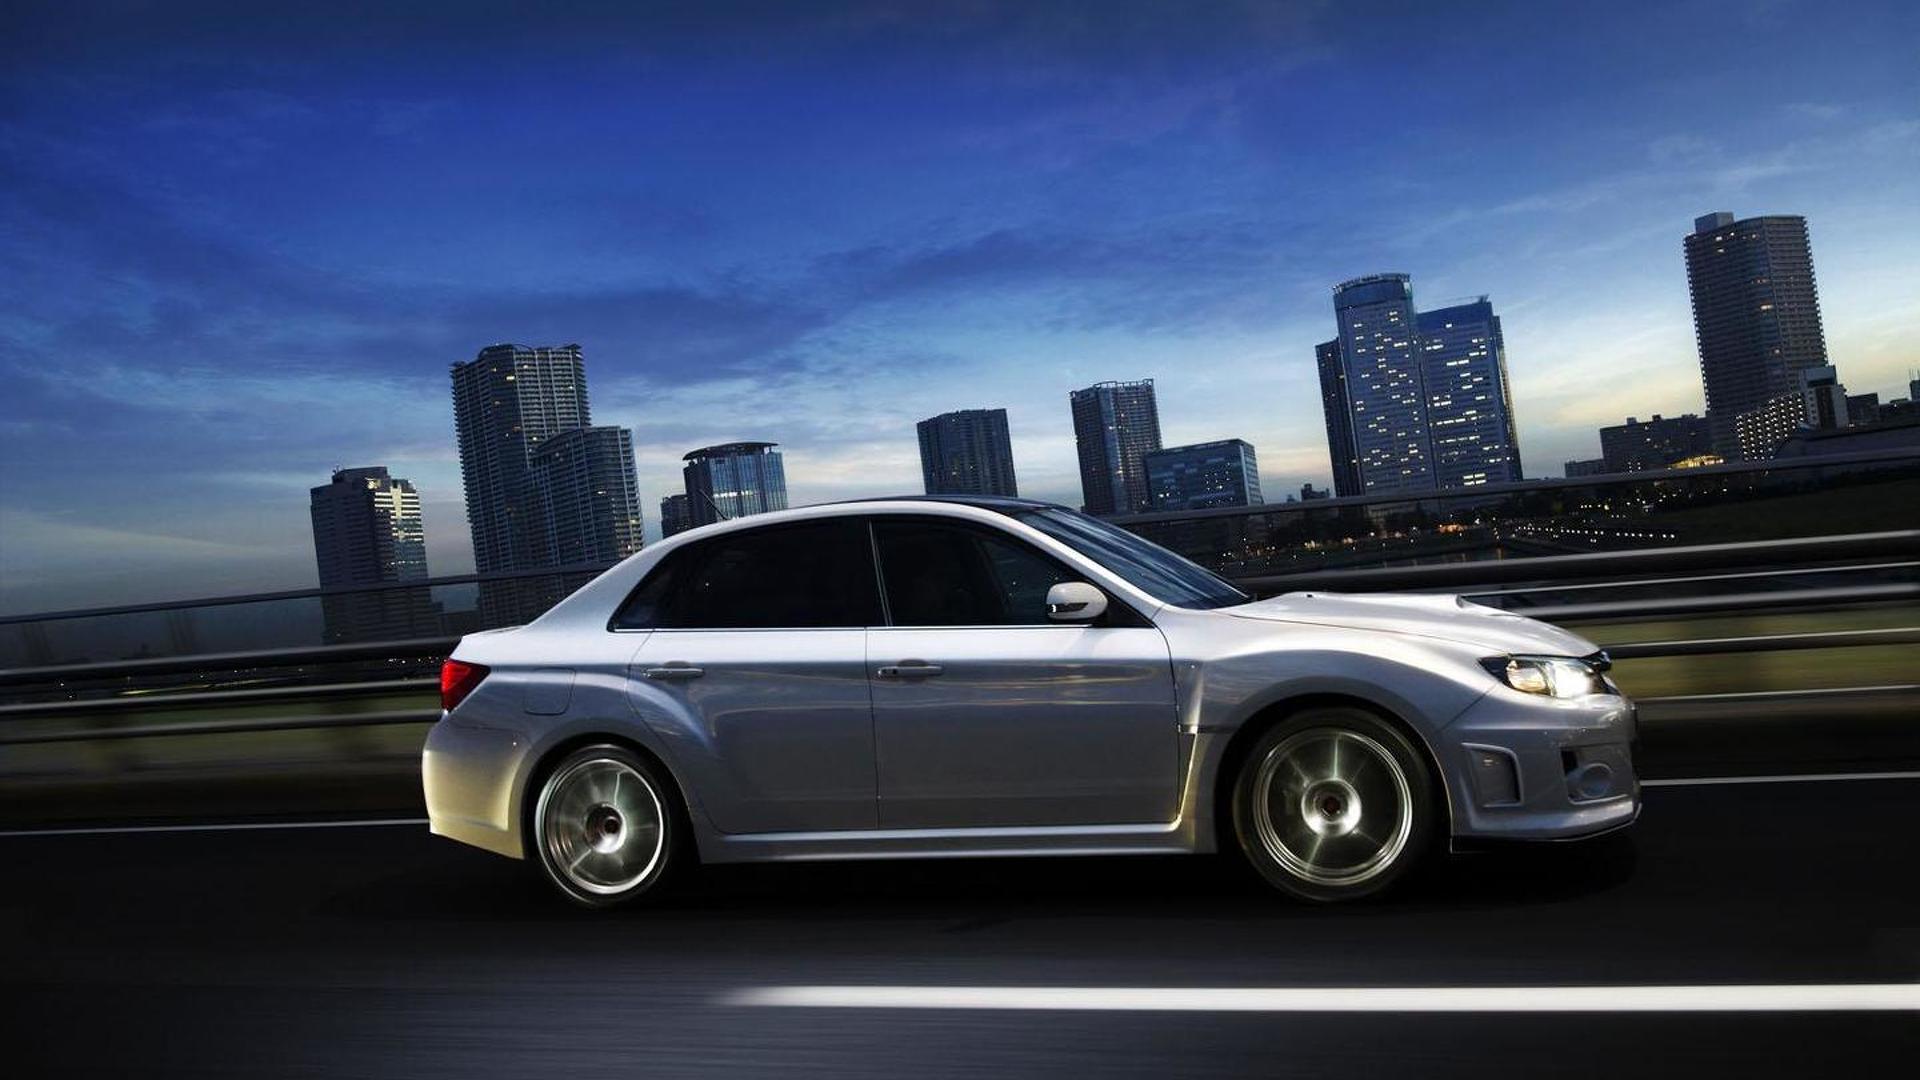 Subaru WRX STI tS announced for Japan